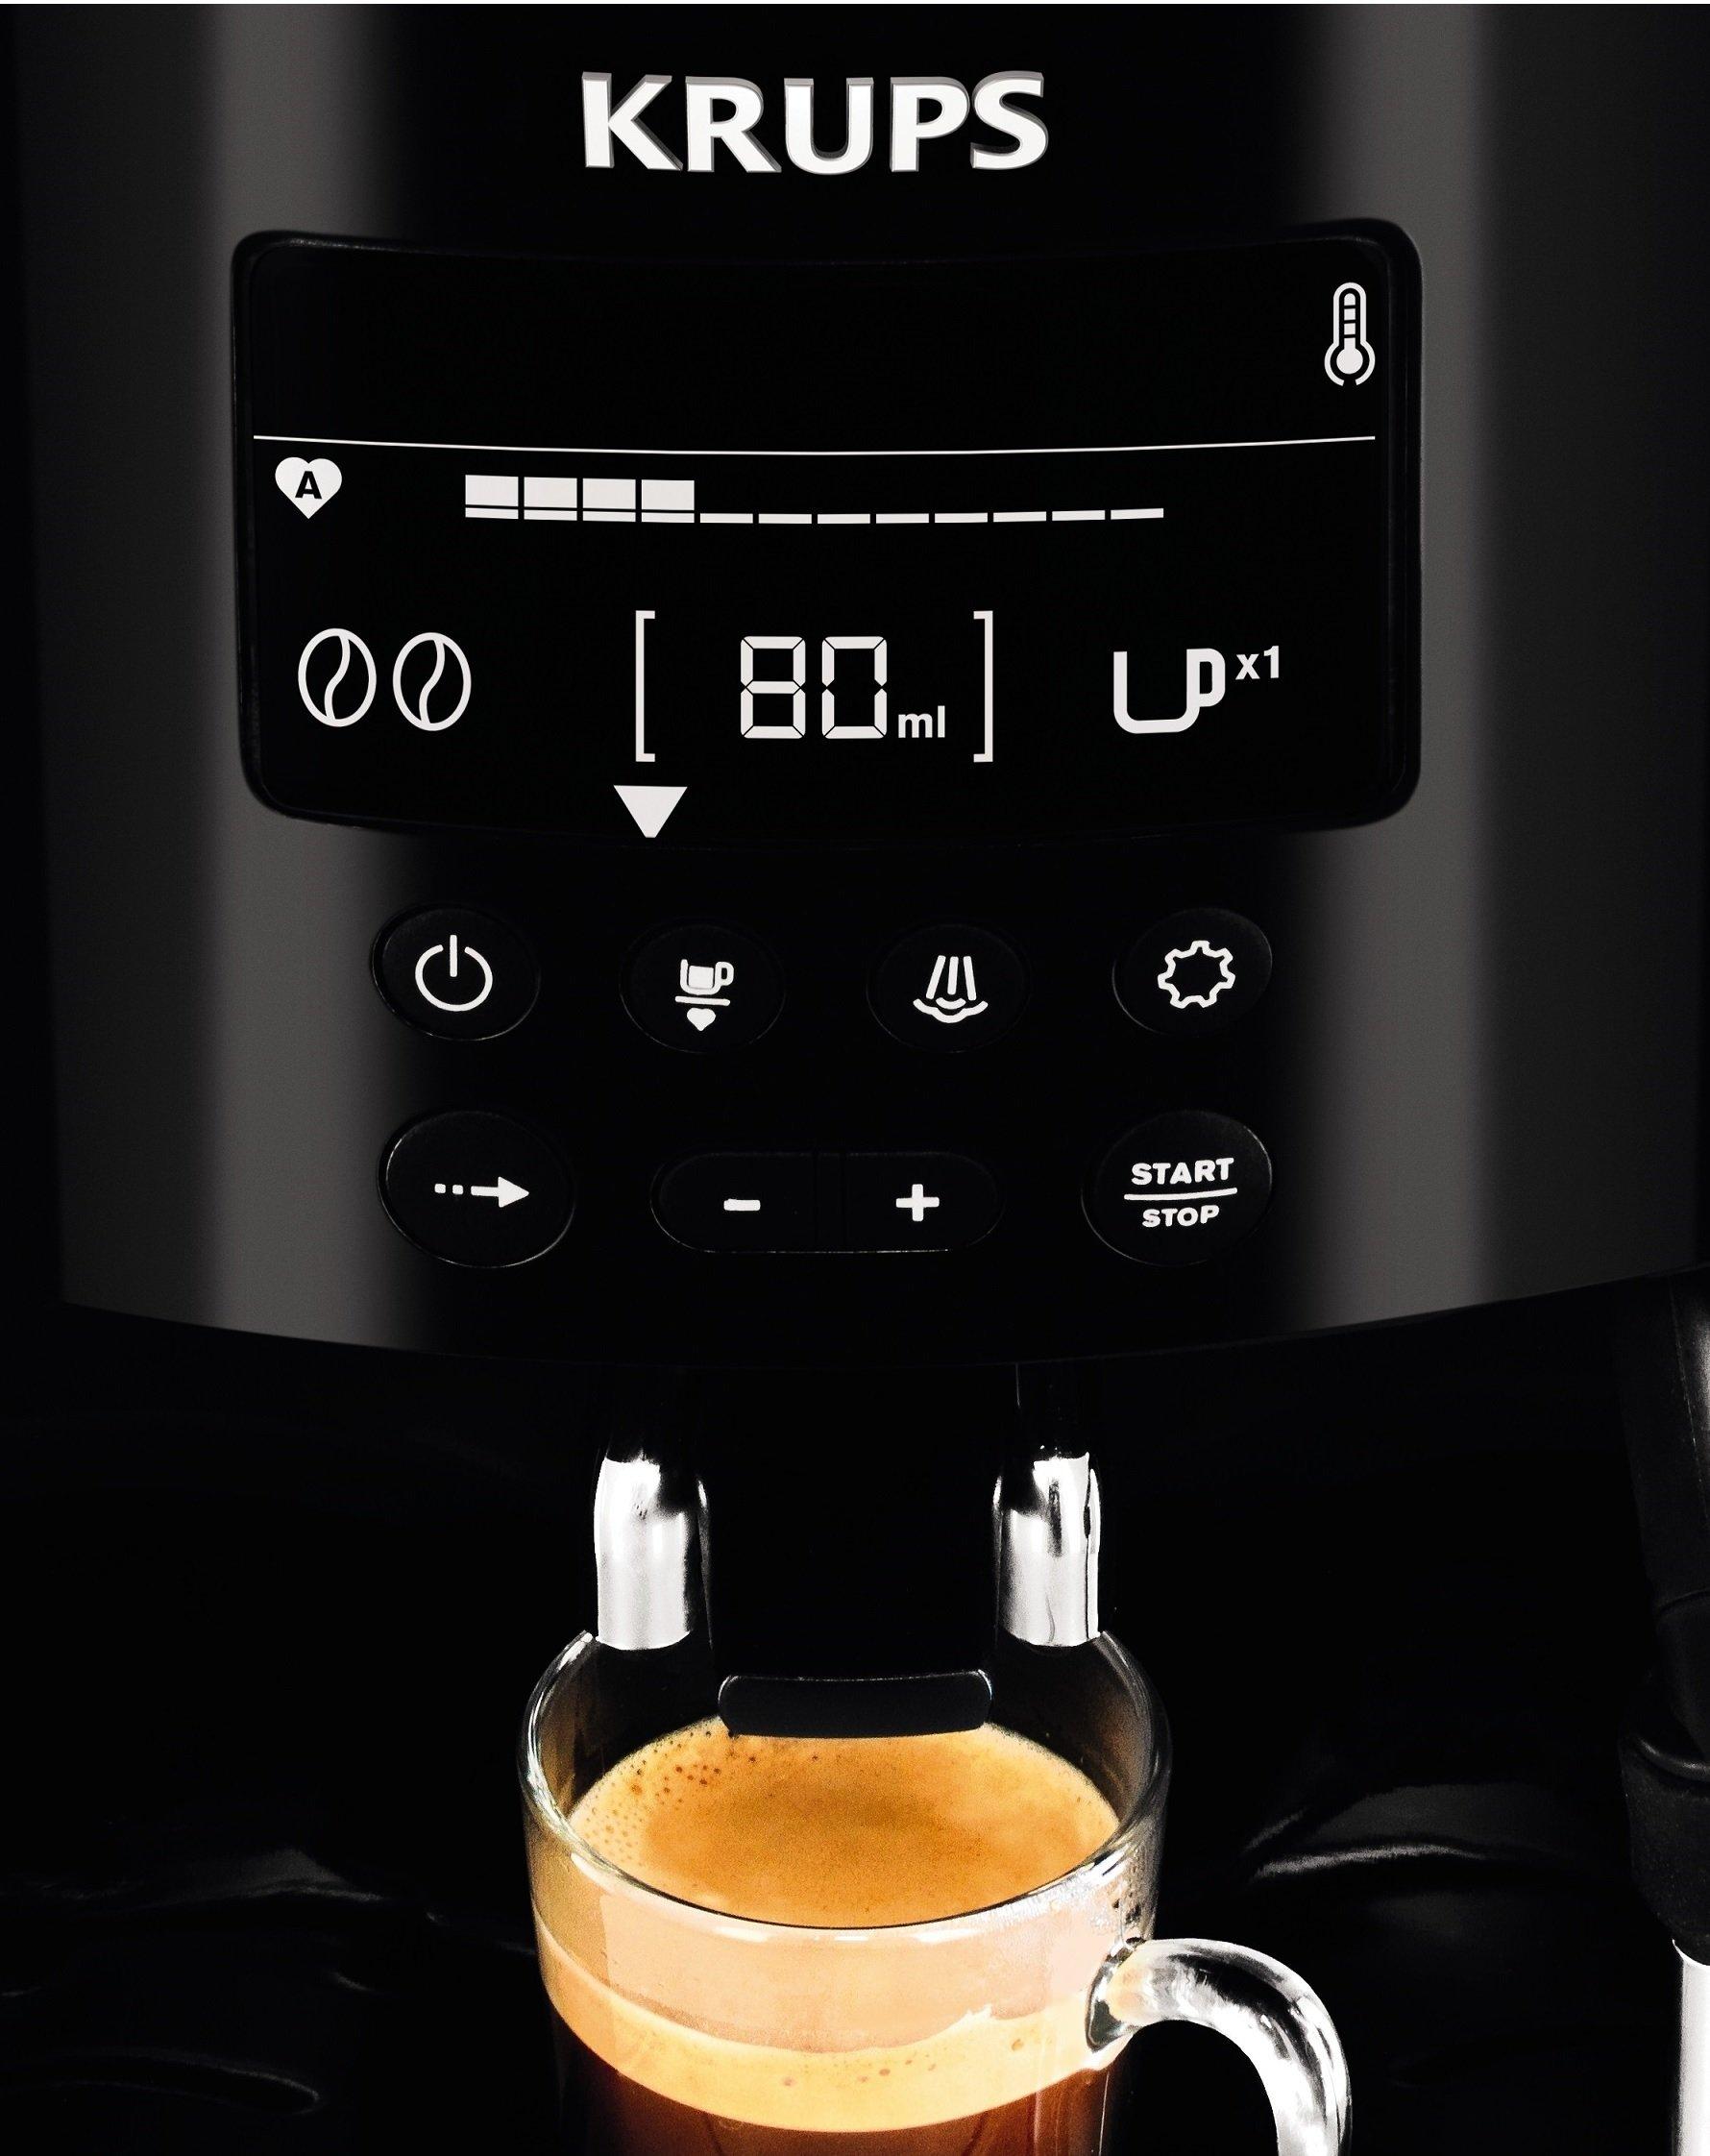 Krups-EA815070-Kaffeevollautomat-1450-Watt-18-Liter-15-bar-LC-Display-CappuccinoPlus-Dse-schwarz